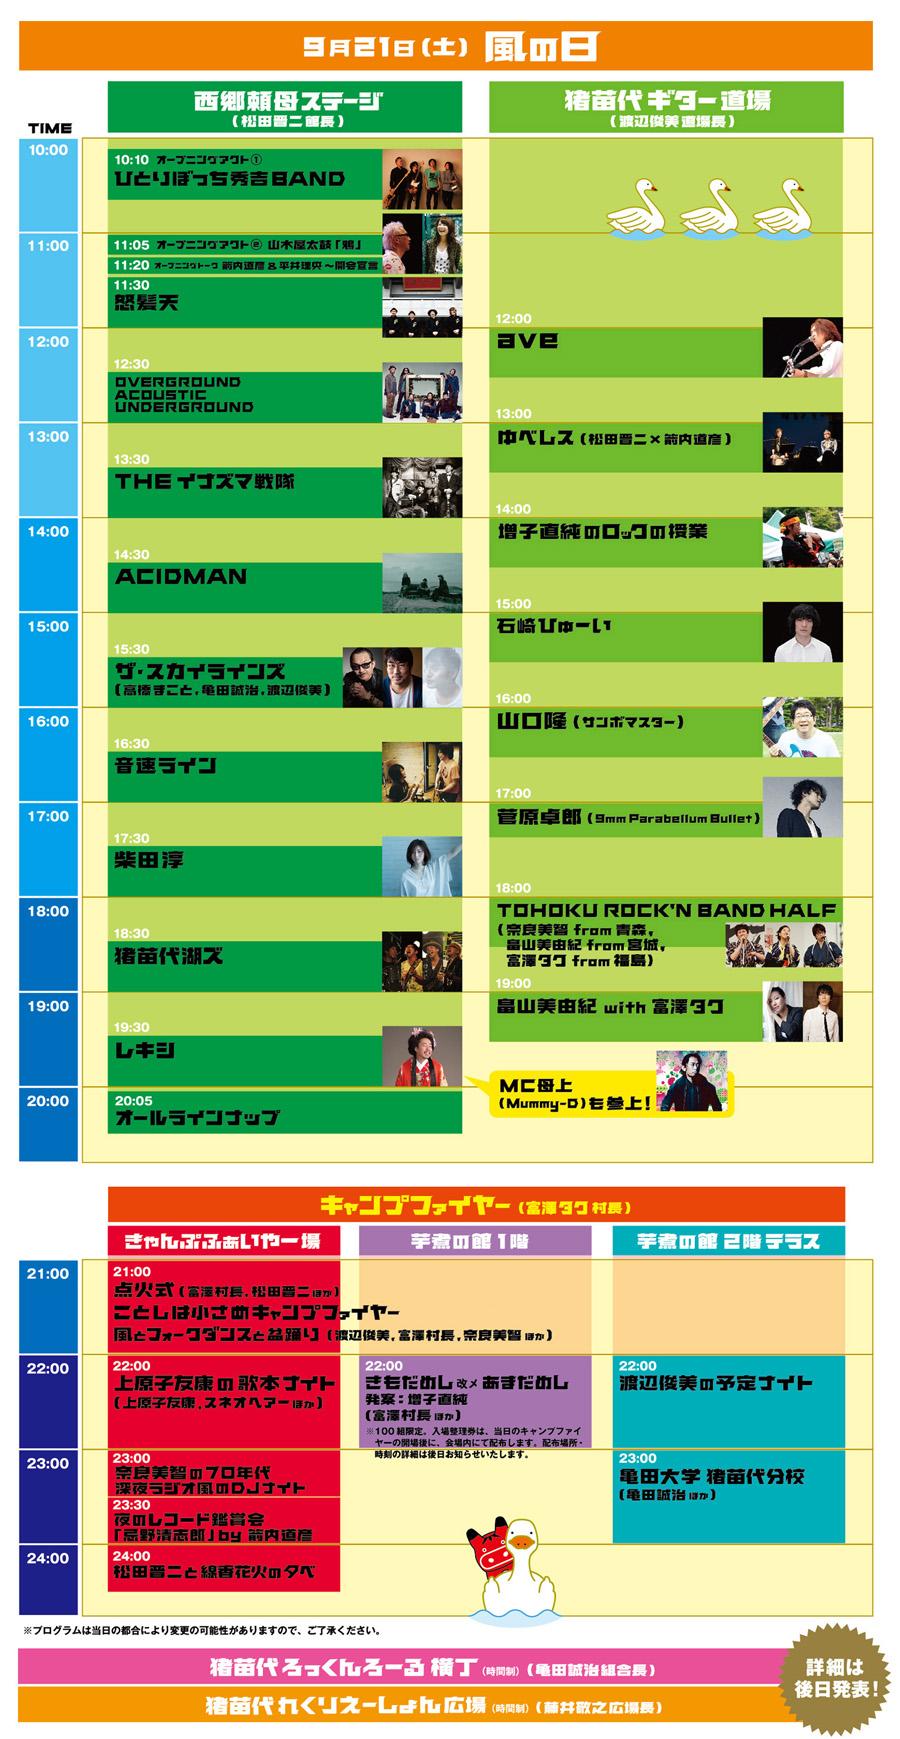 timetable_imoni2013_0921.jpg